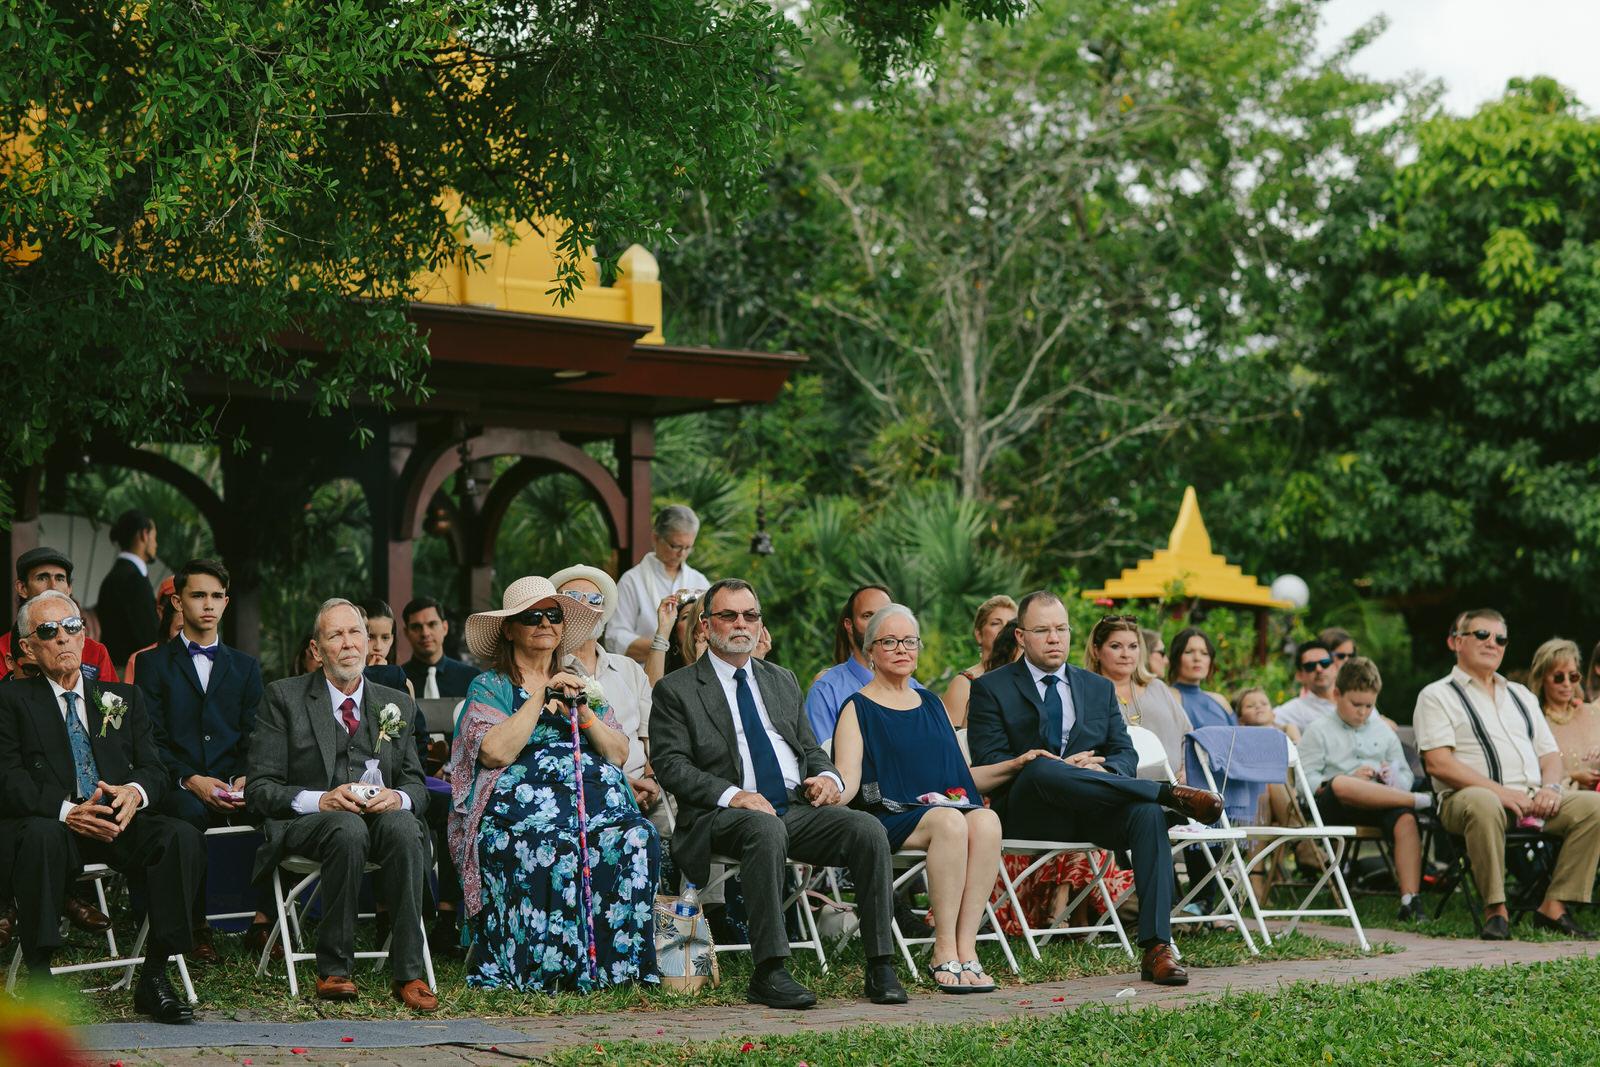 kashi-ashram-wedding-ceremony-sebastian-florida-tiny-house-photo-25.jpg